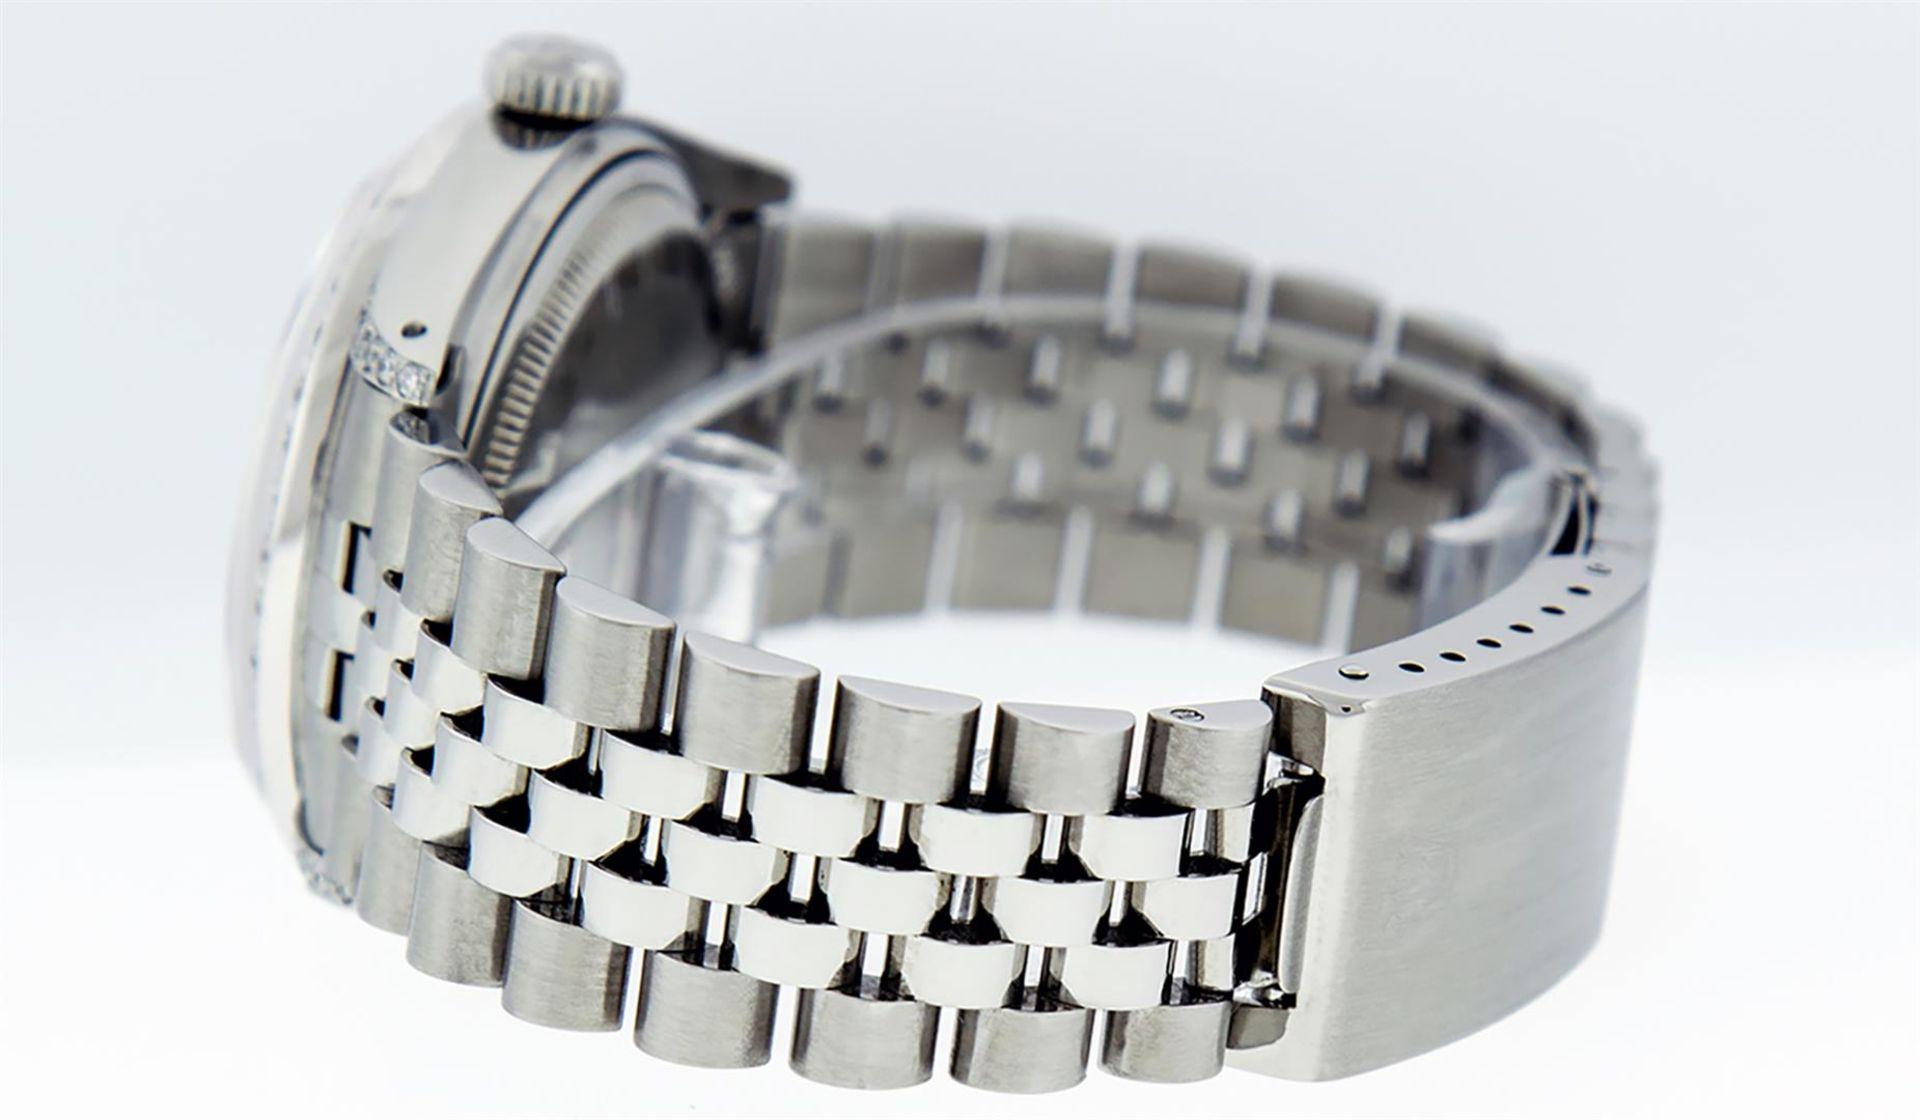 Rolex Mens Stainless Steel Diamond Lugs & Ruby Datejust Wristwatch - Image 7 of 8